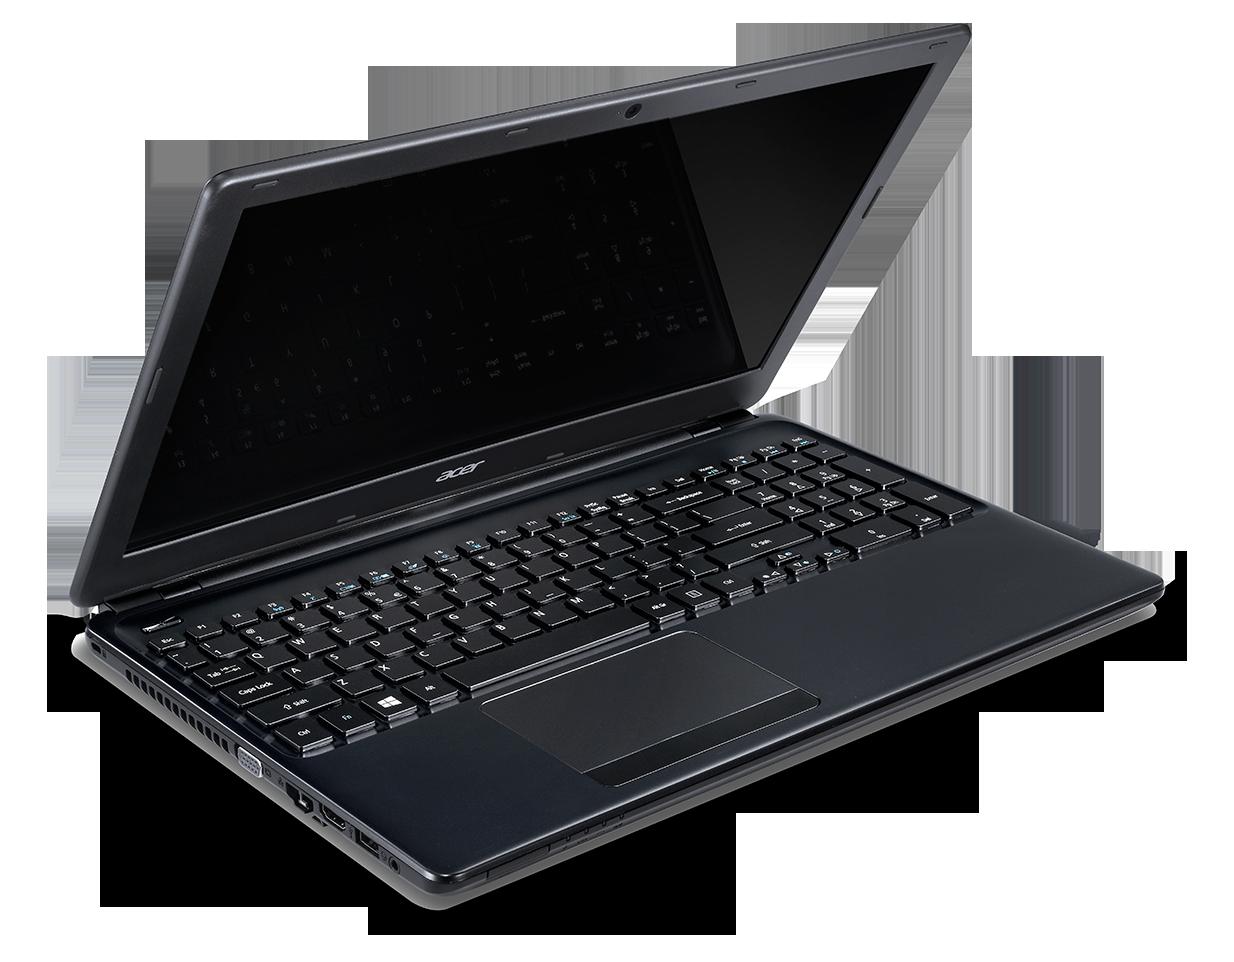 aspire e1 532 2616 laptops tech specs reviews acer. Black Bedroom Furniture Sets. Home Design Ideas